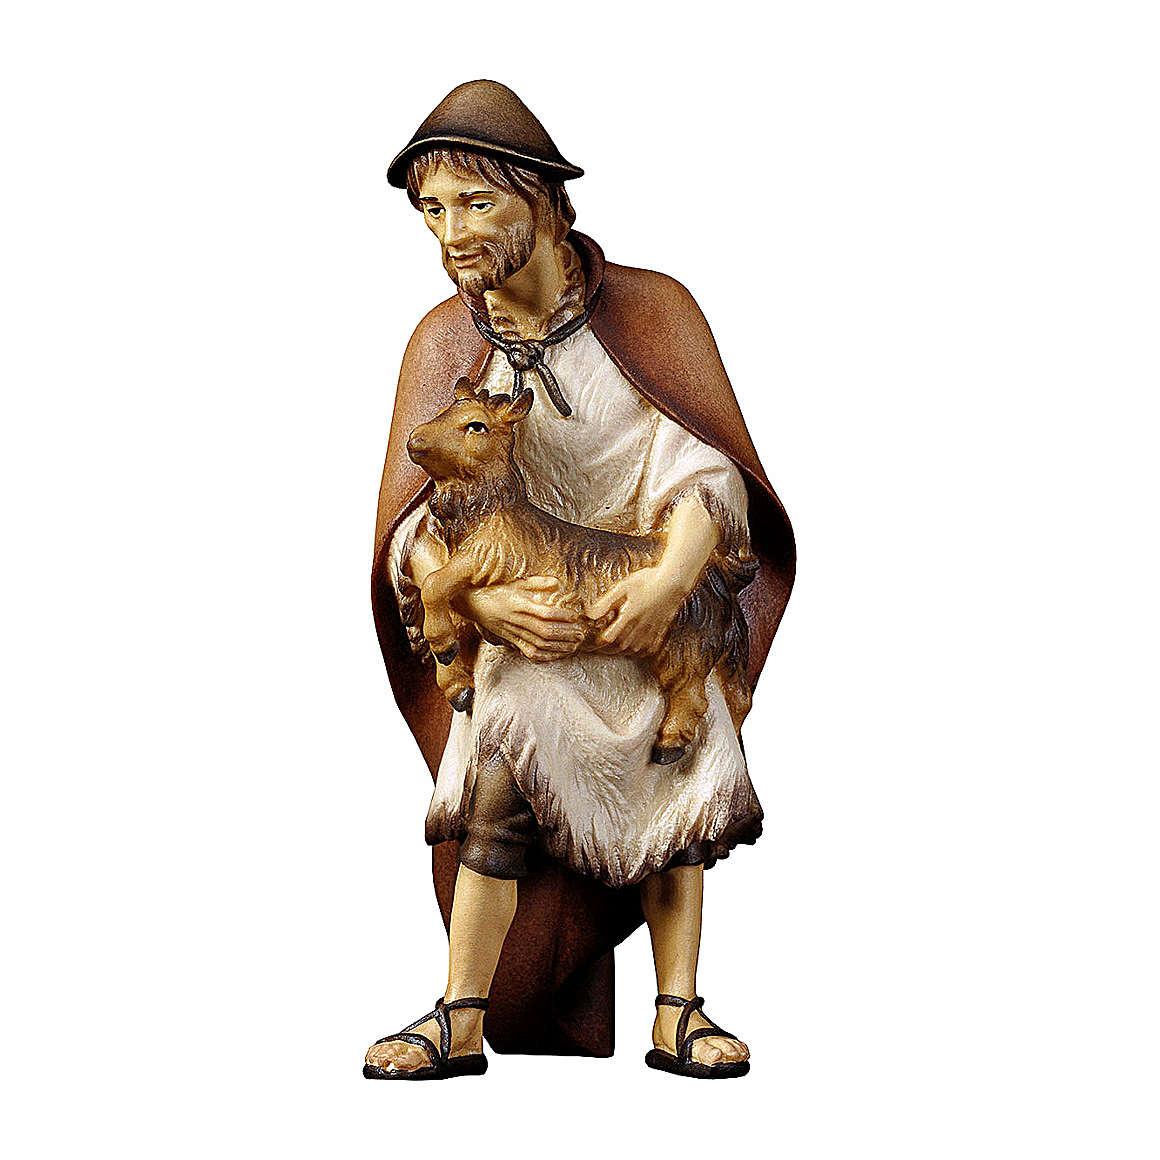 Pastore con capretta presepe Original legno dipinto Valgardena 12 cm 4